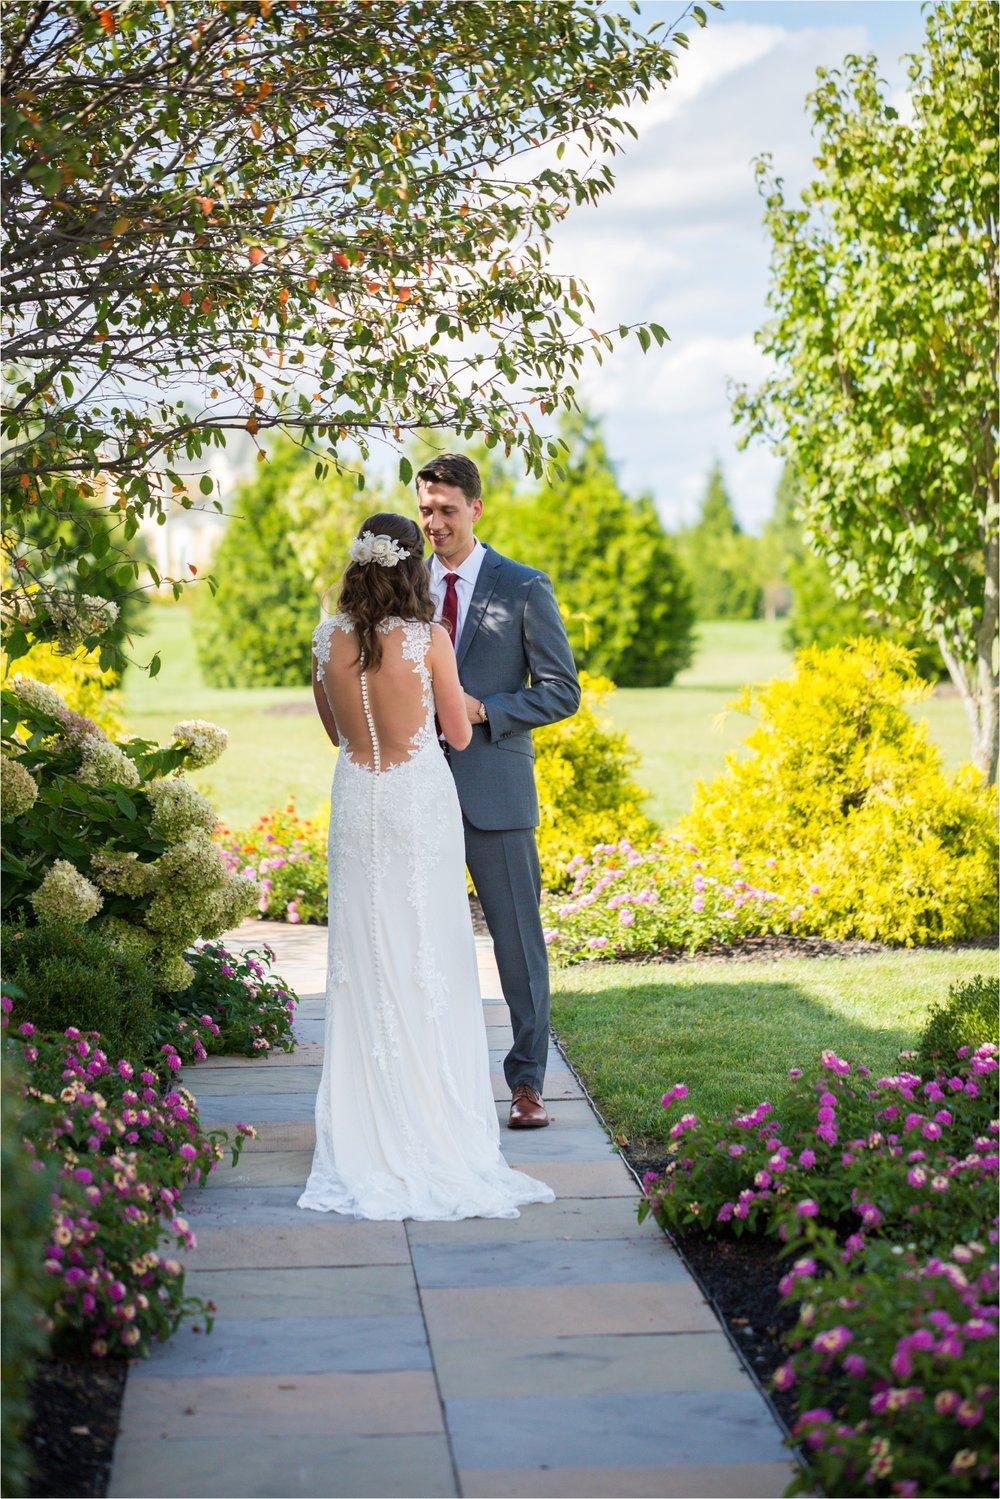 Feather-and-Oak-Photography-Cross-Keys-Vineyard-Wedding-0272.jpg